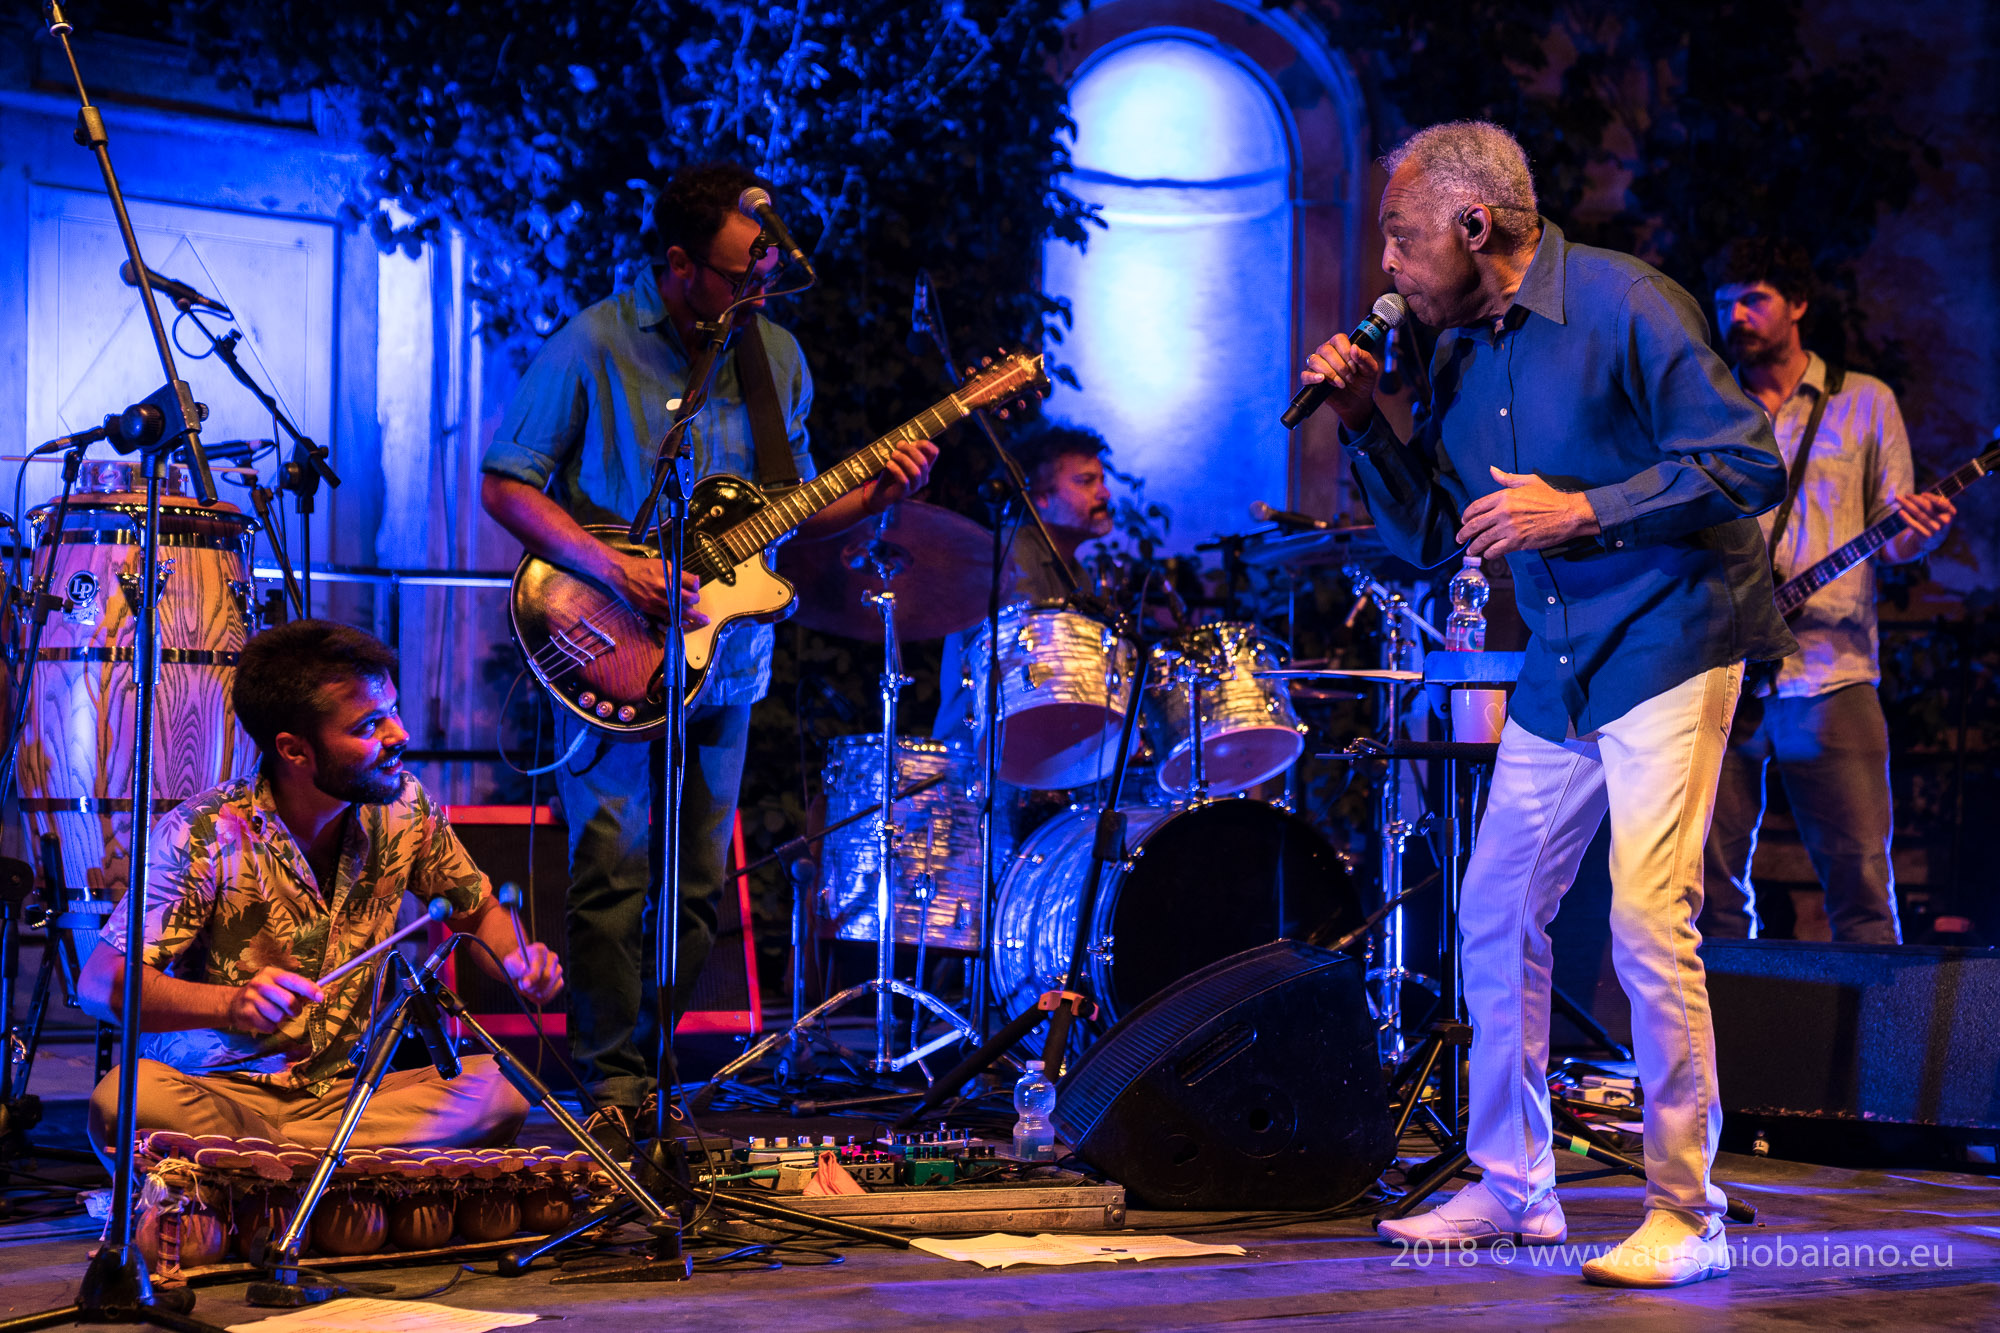 Gilberto Gil with Thomas Harres - Refavela 40